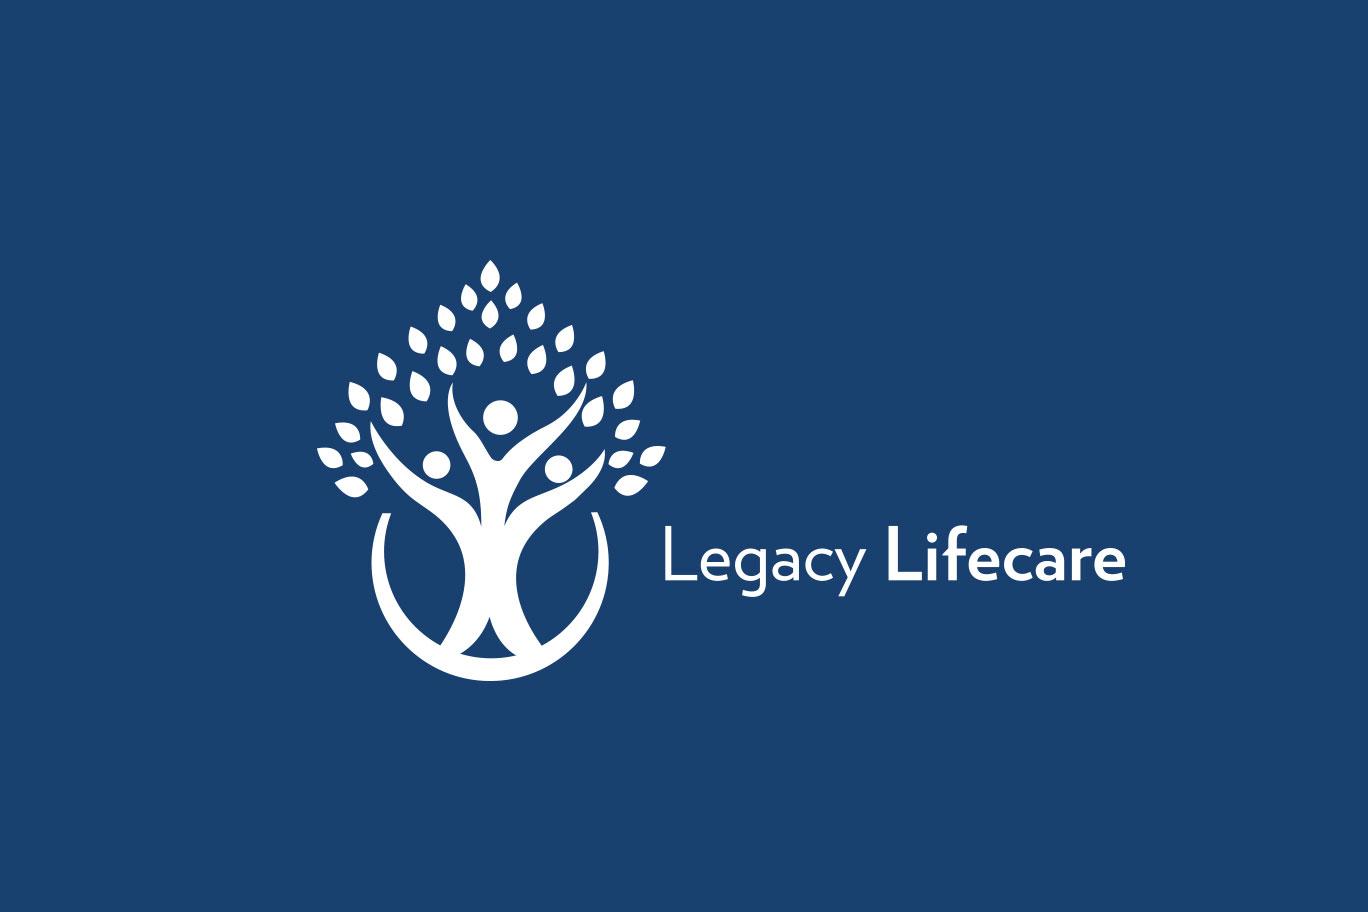 Legacy Lifecare